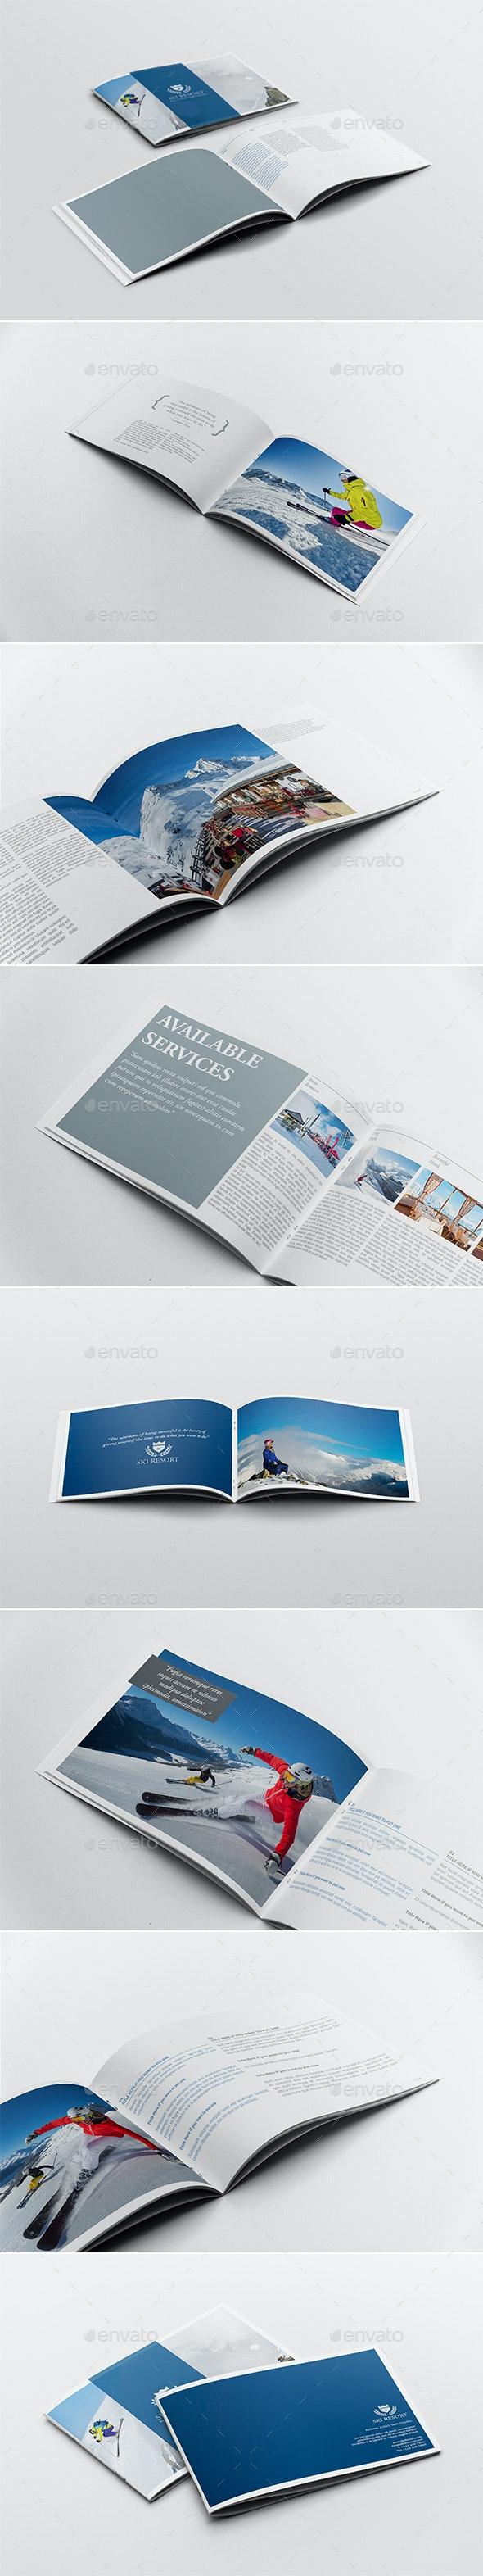 Travel Brochure / Guide Template - Brochures Print Templates